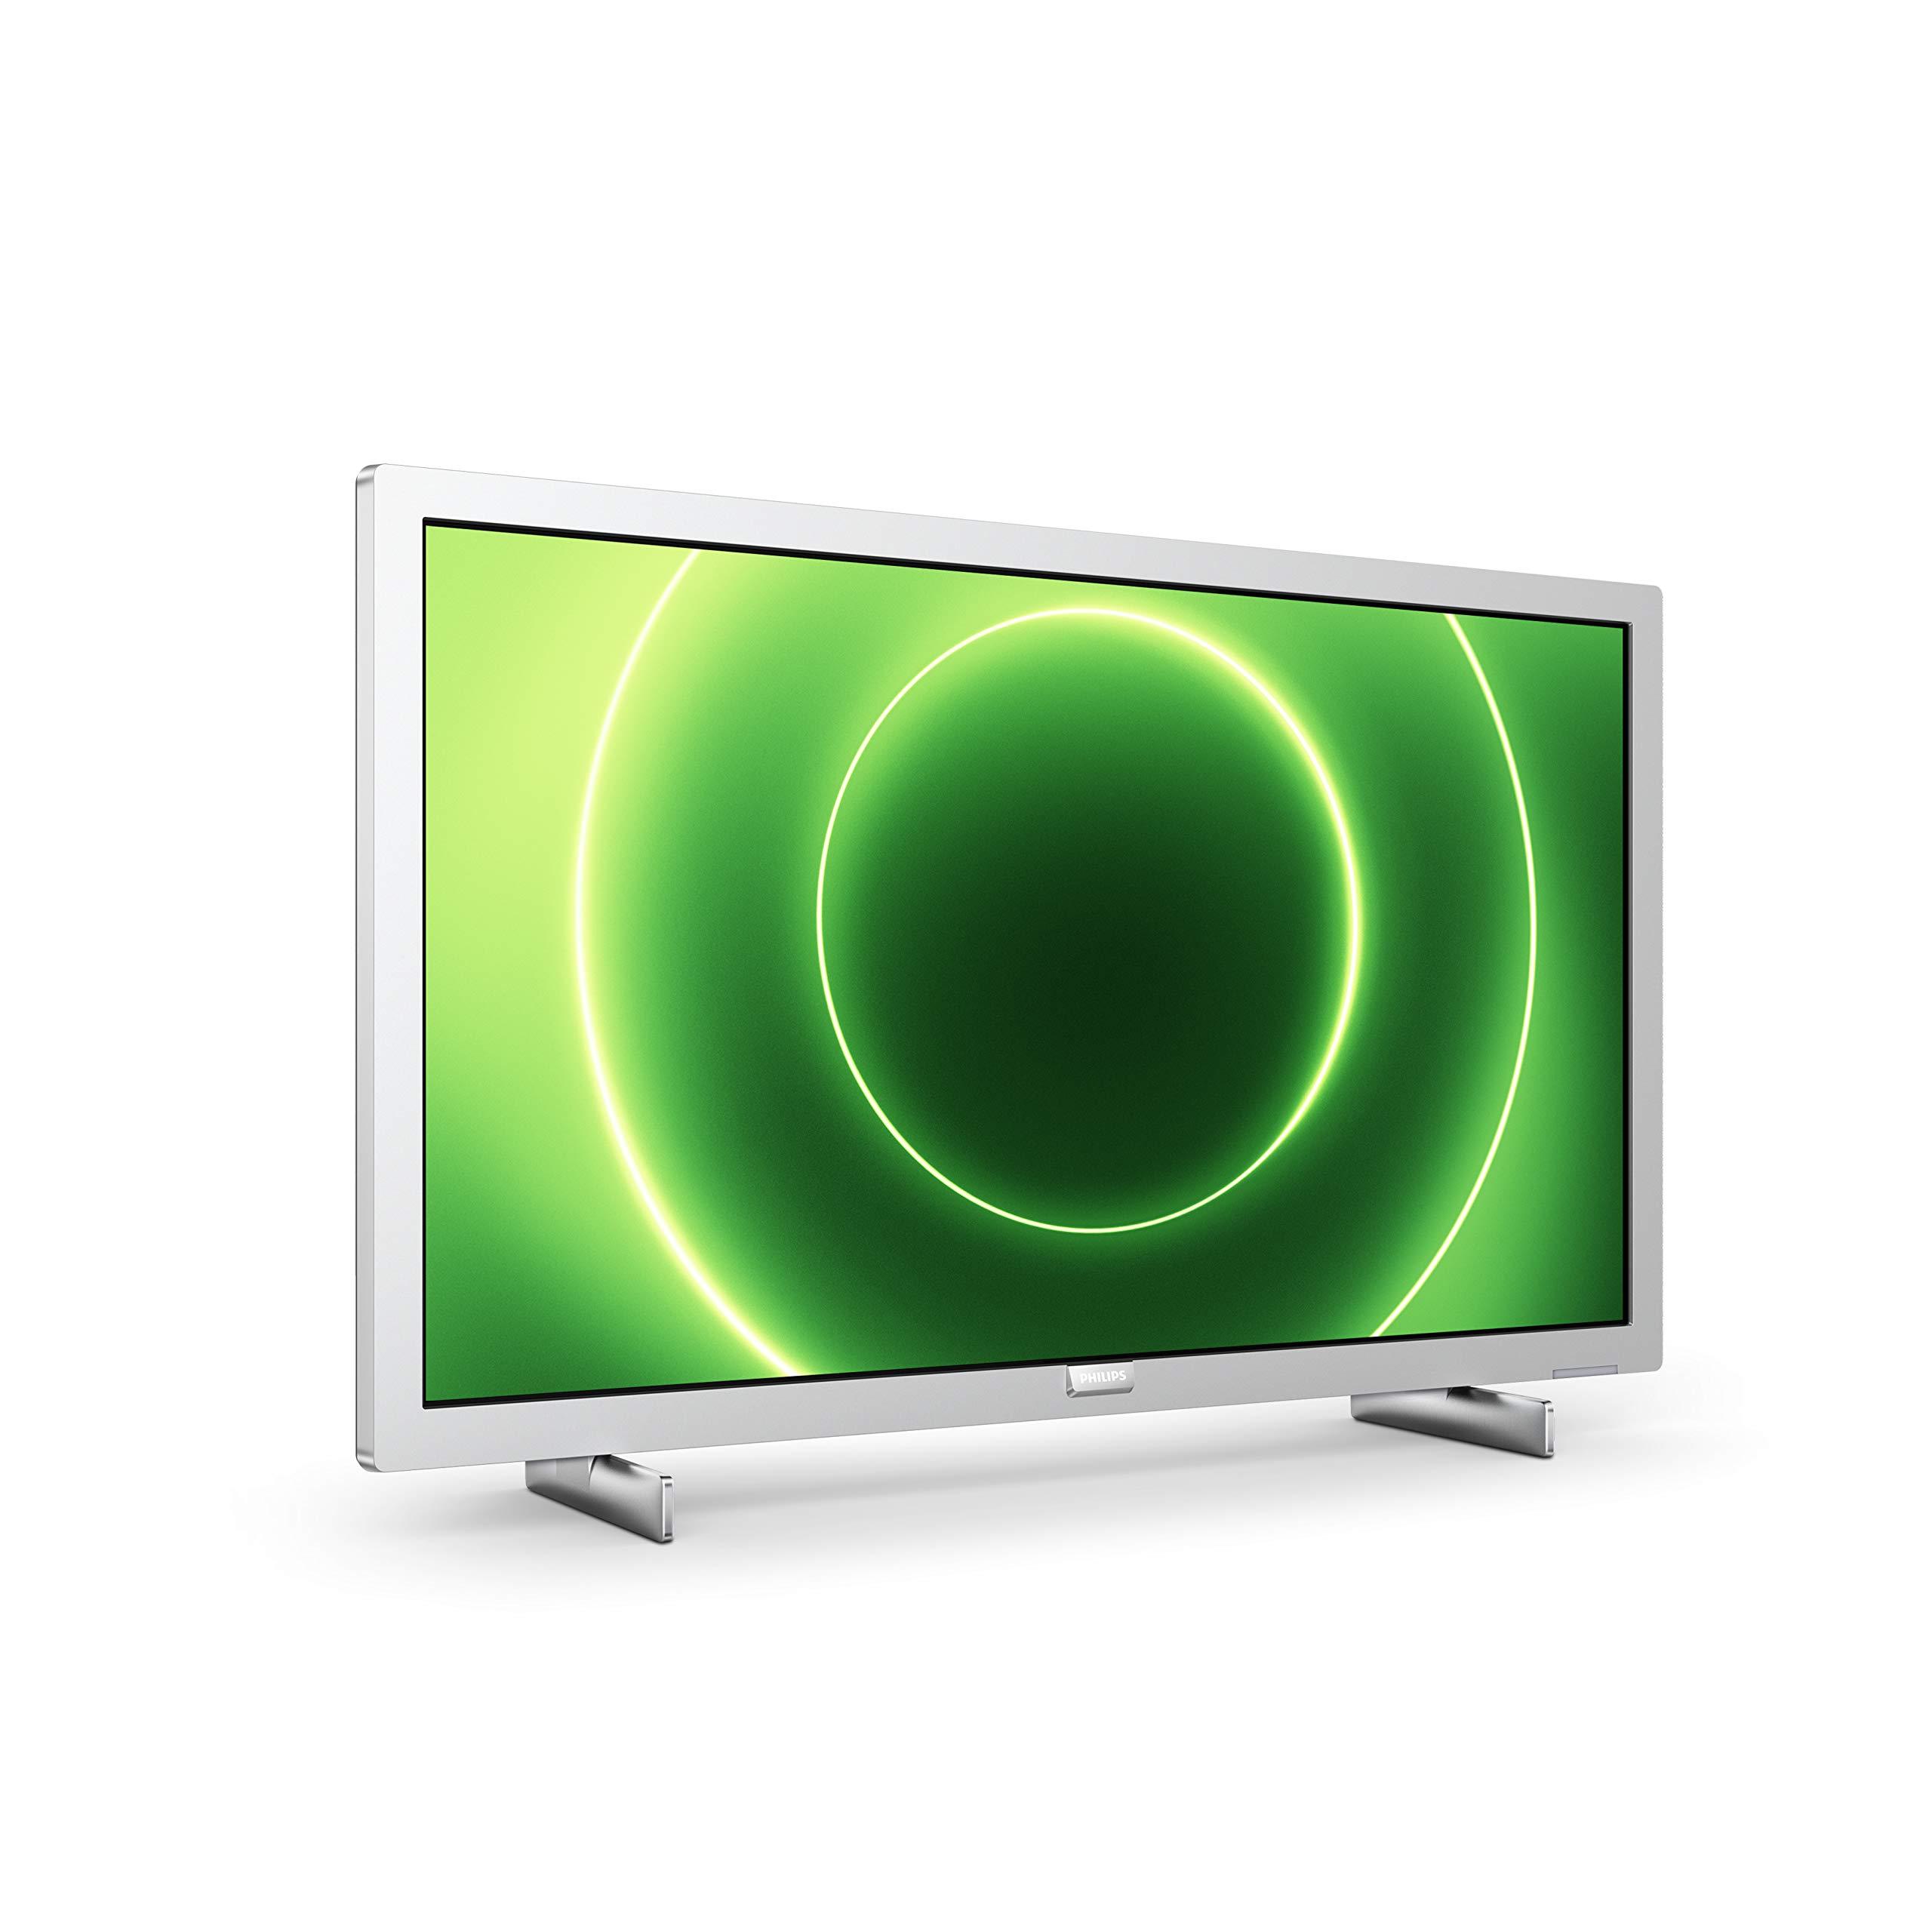 Philips 24PFS6855/12 Televisor 24 Pulgadas LED,Full HD, HDR 10, Pixel Plus HD, Smart TV, DTS-HD, HDMI,Modelo 2020/2021, Plateado Claro, 60 cm: Amazon. es: Electrónica